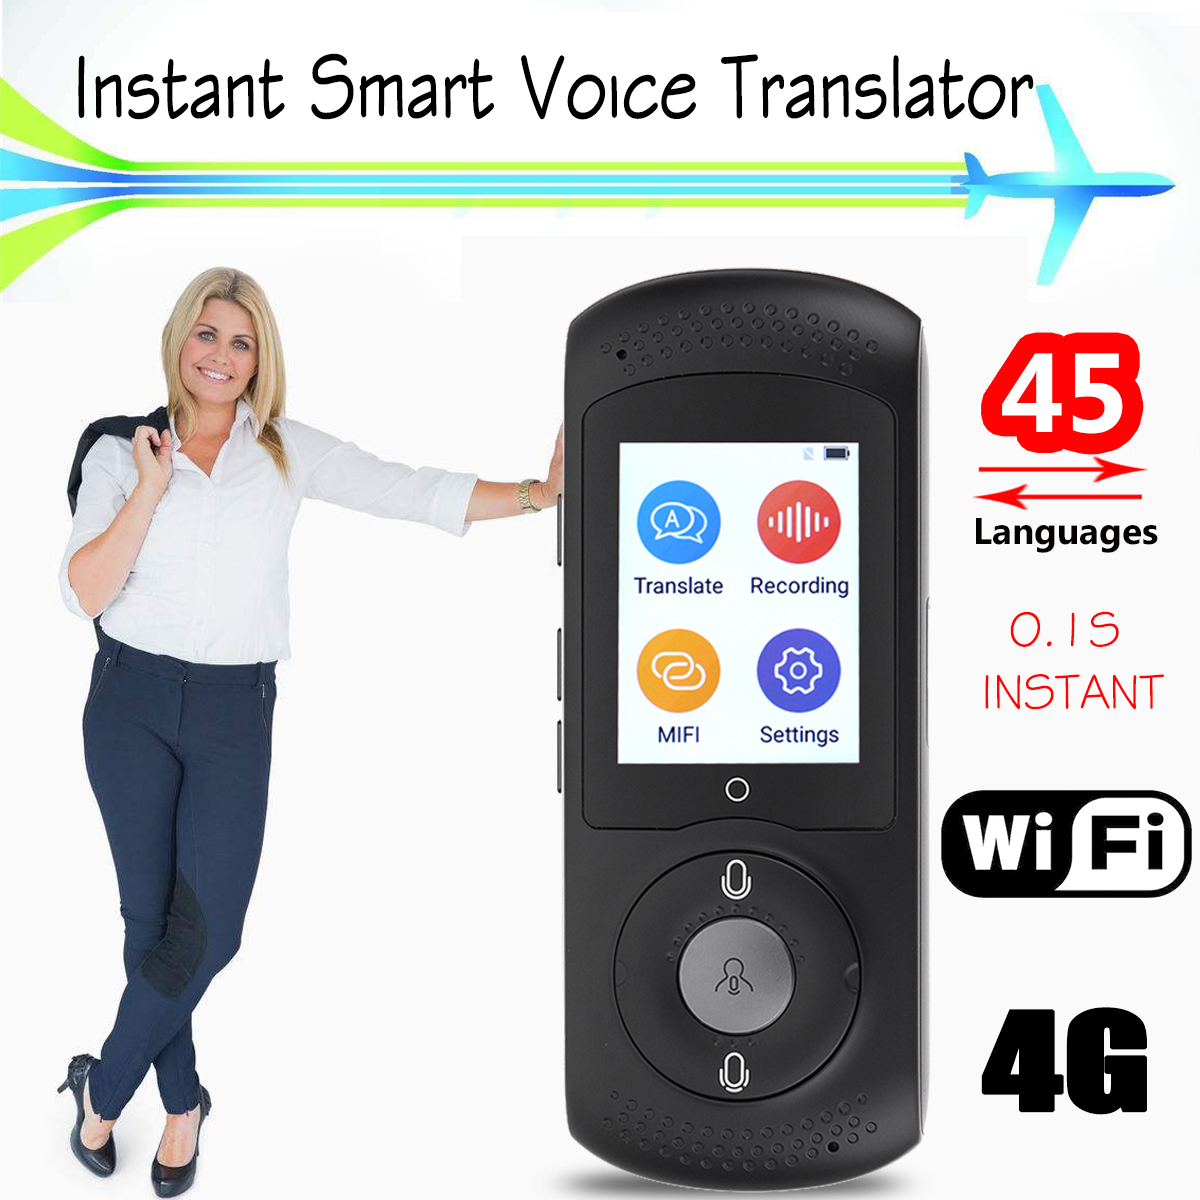 Portable Smart Voice Translator Wifi Instant Voice Translator Real Time 45 Multi-language Translation Traductor For Business portable smart voice translator two way real time wifi 43 languages instant traductor translation for learning meeting business